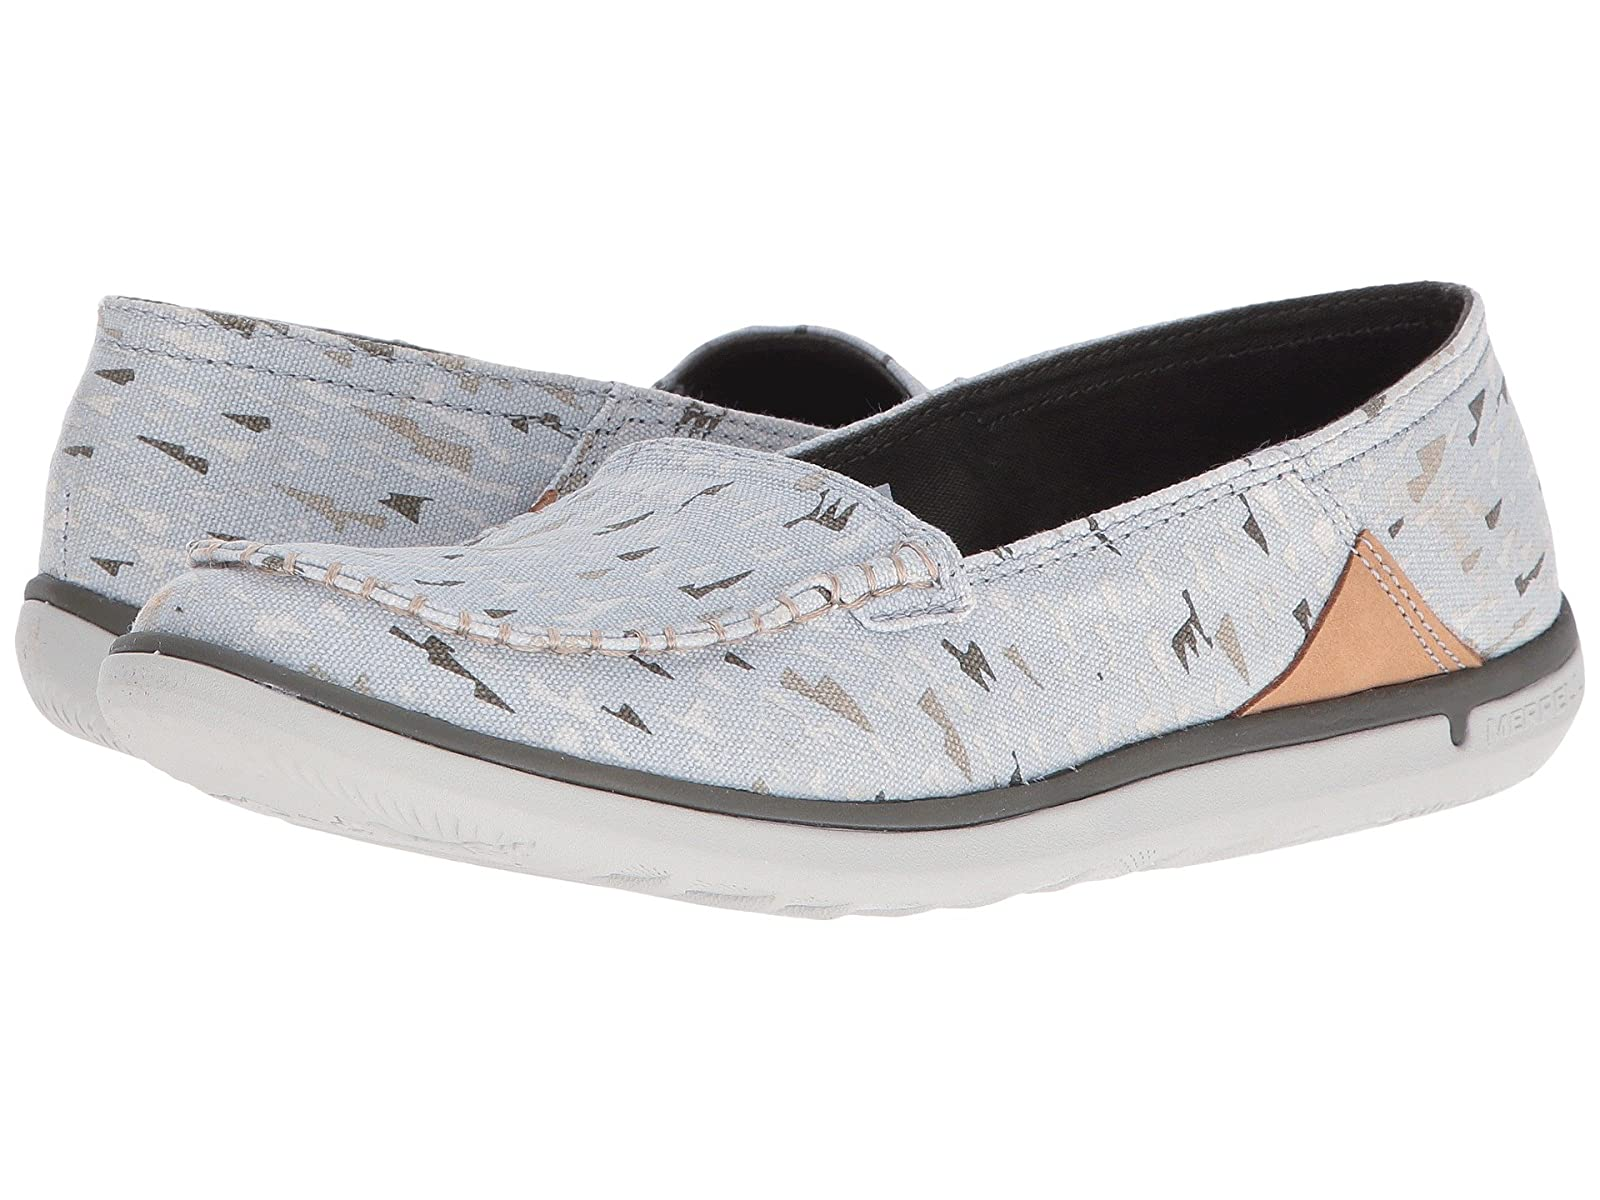 Merrell Duskair Moc PrintCheap and distinctive eye-catching shoes